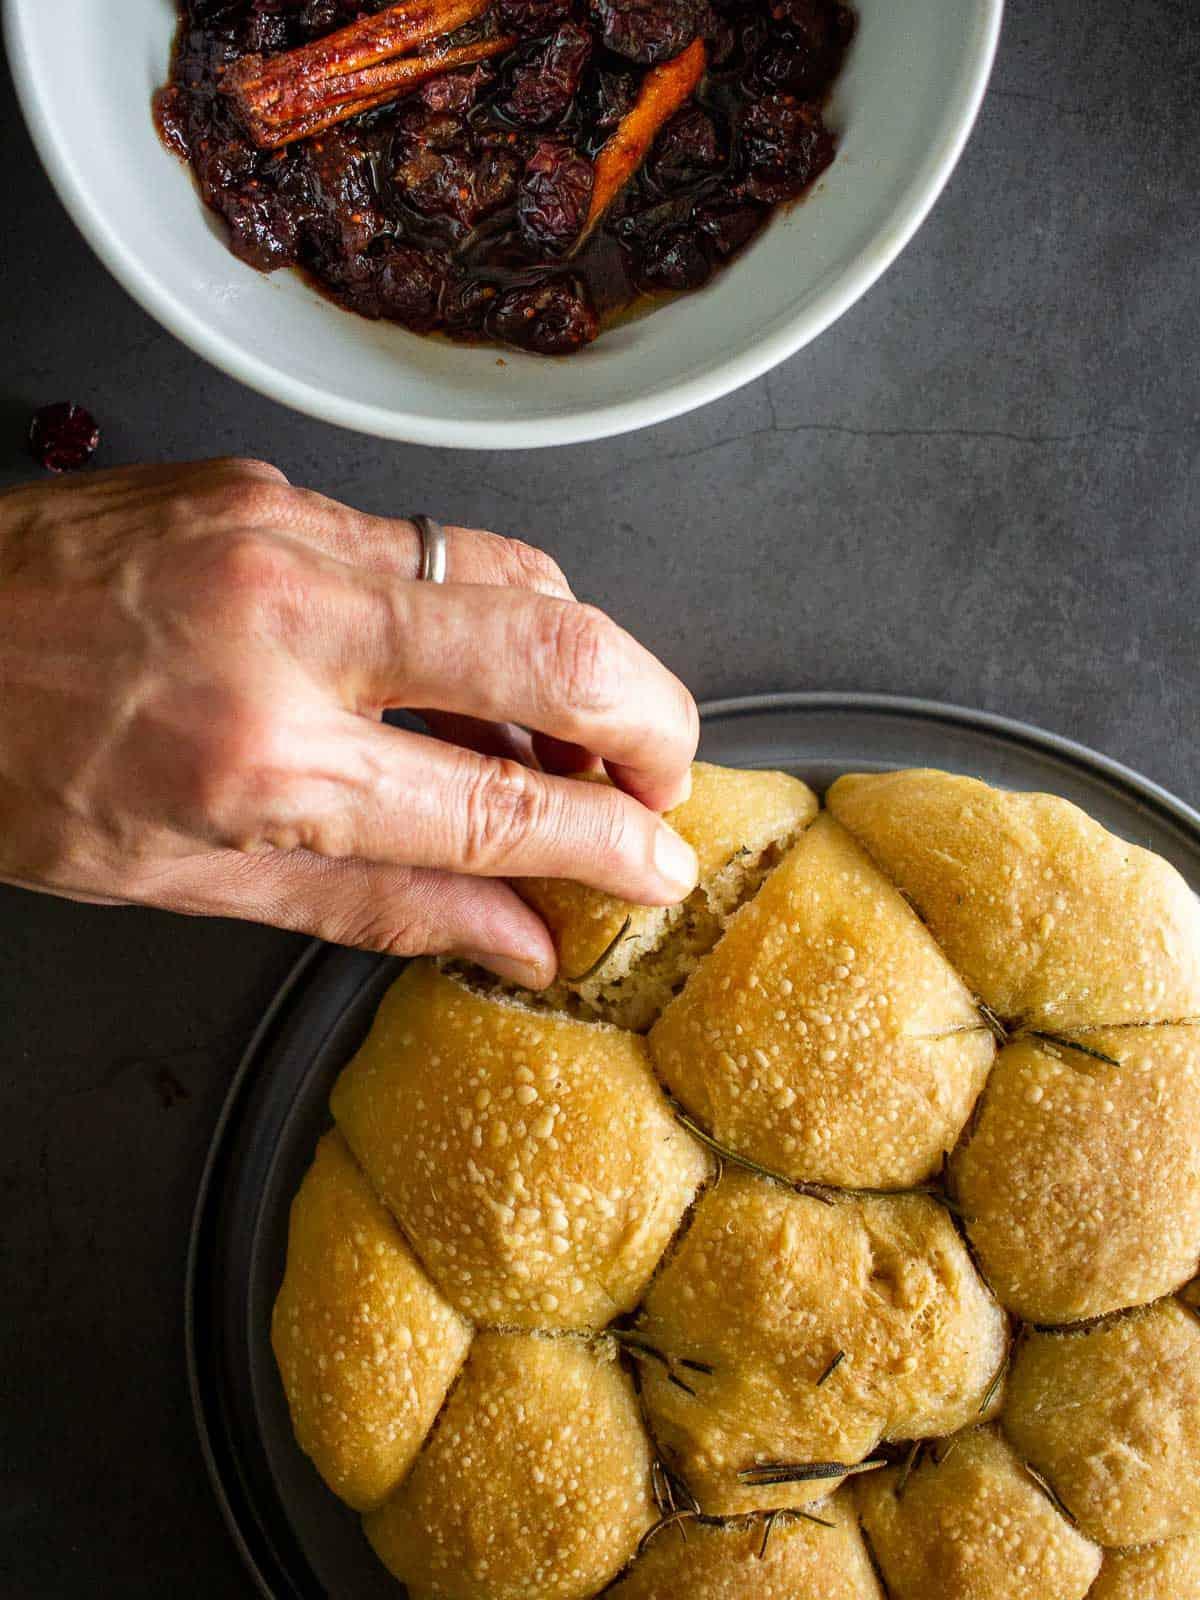 buns with cranberry sauce